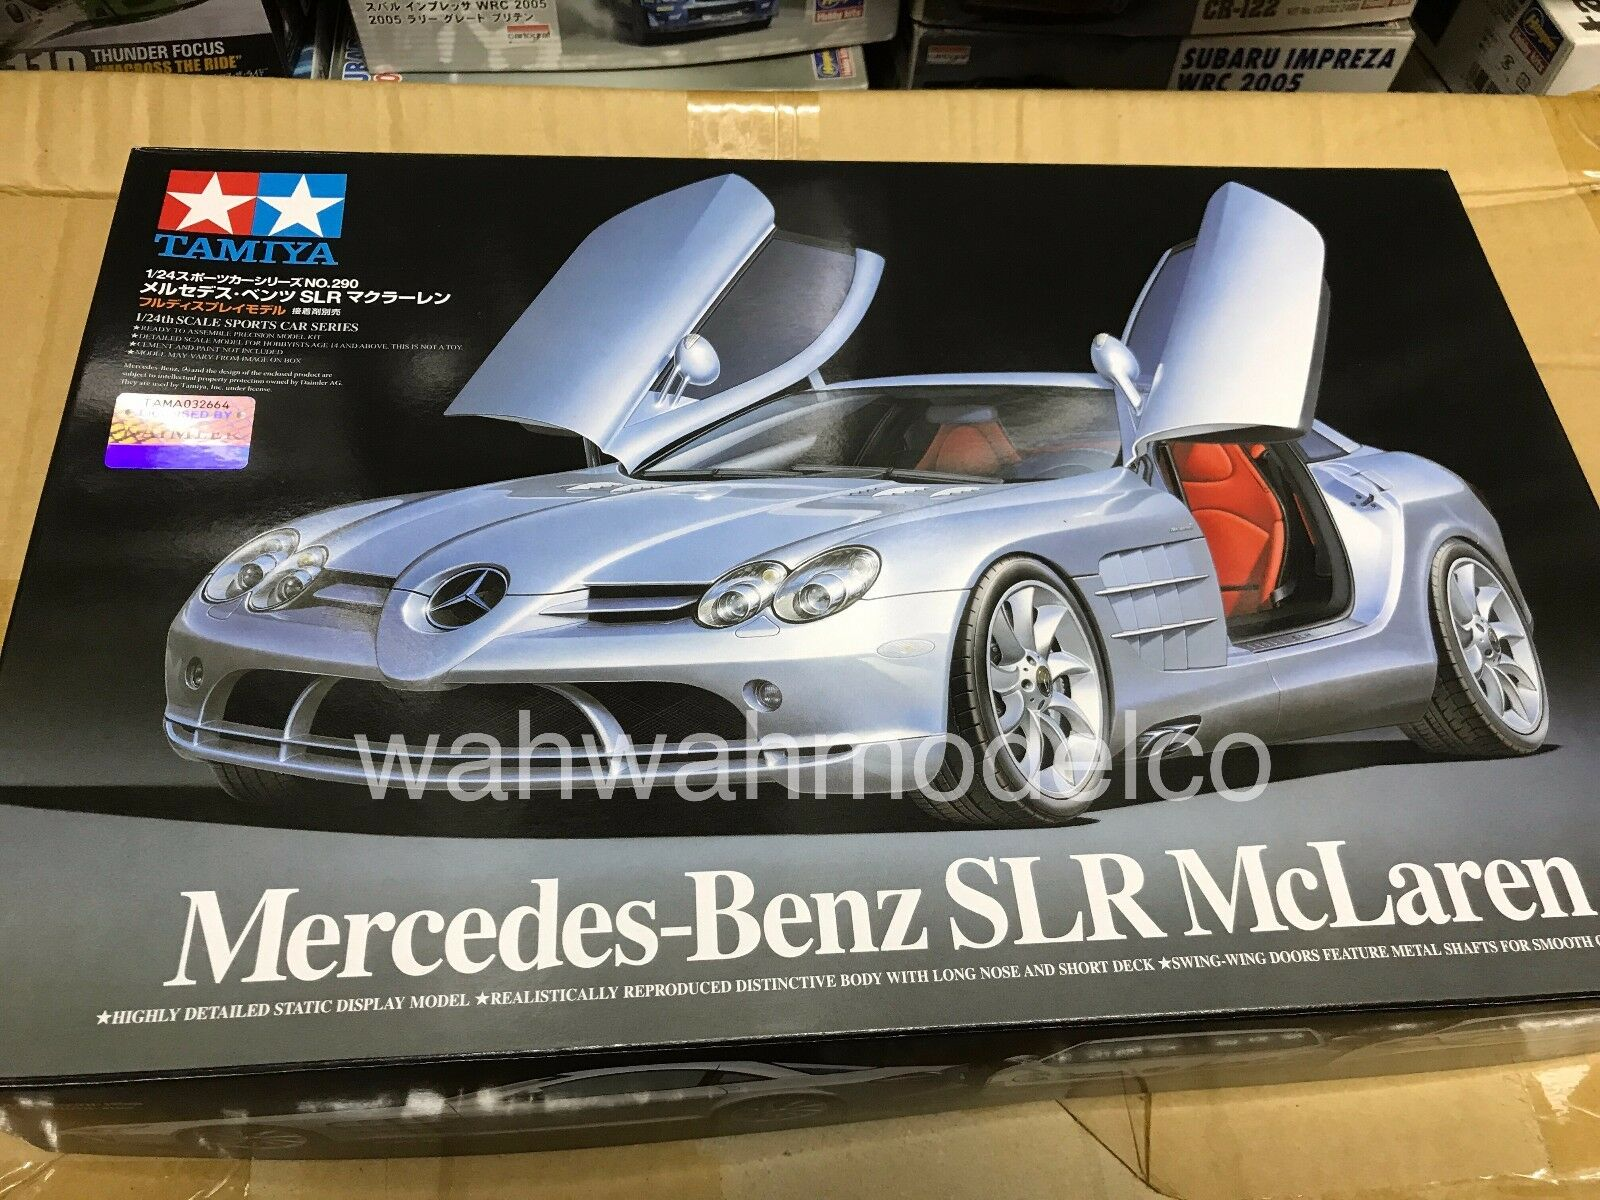 Tamiya 24290 Mercedes-Benz SLR McLaren 1 24